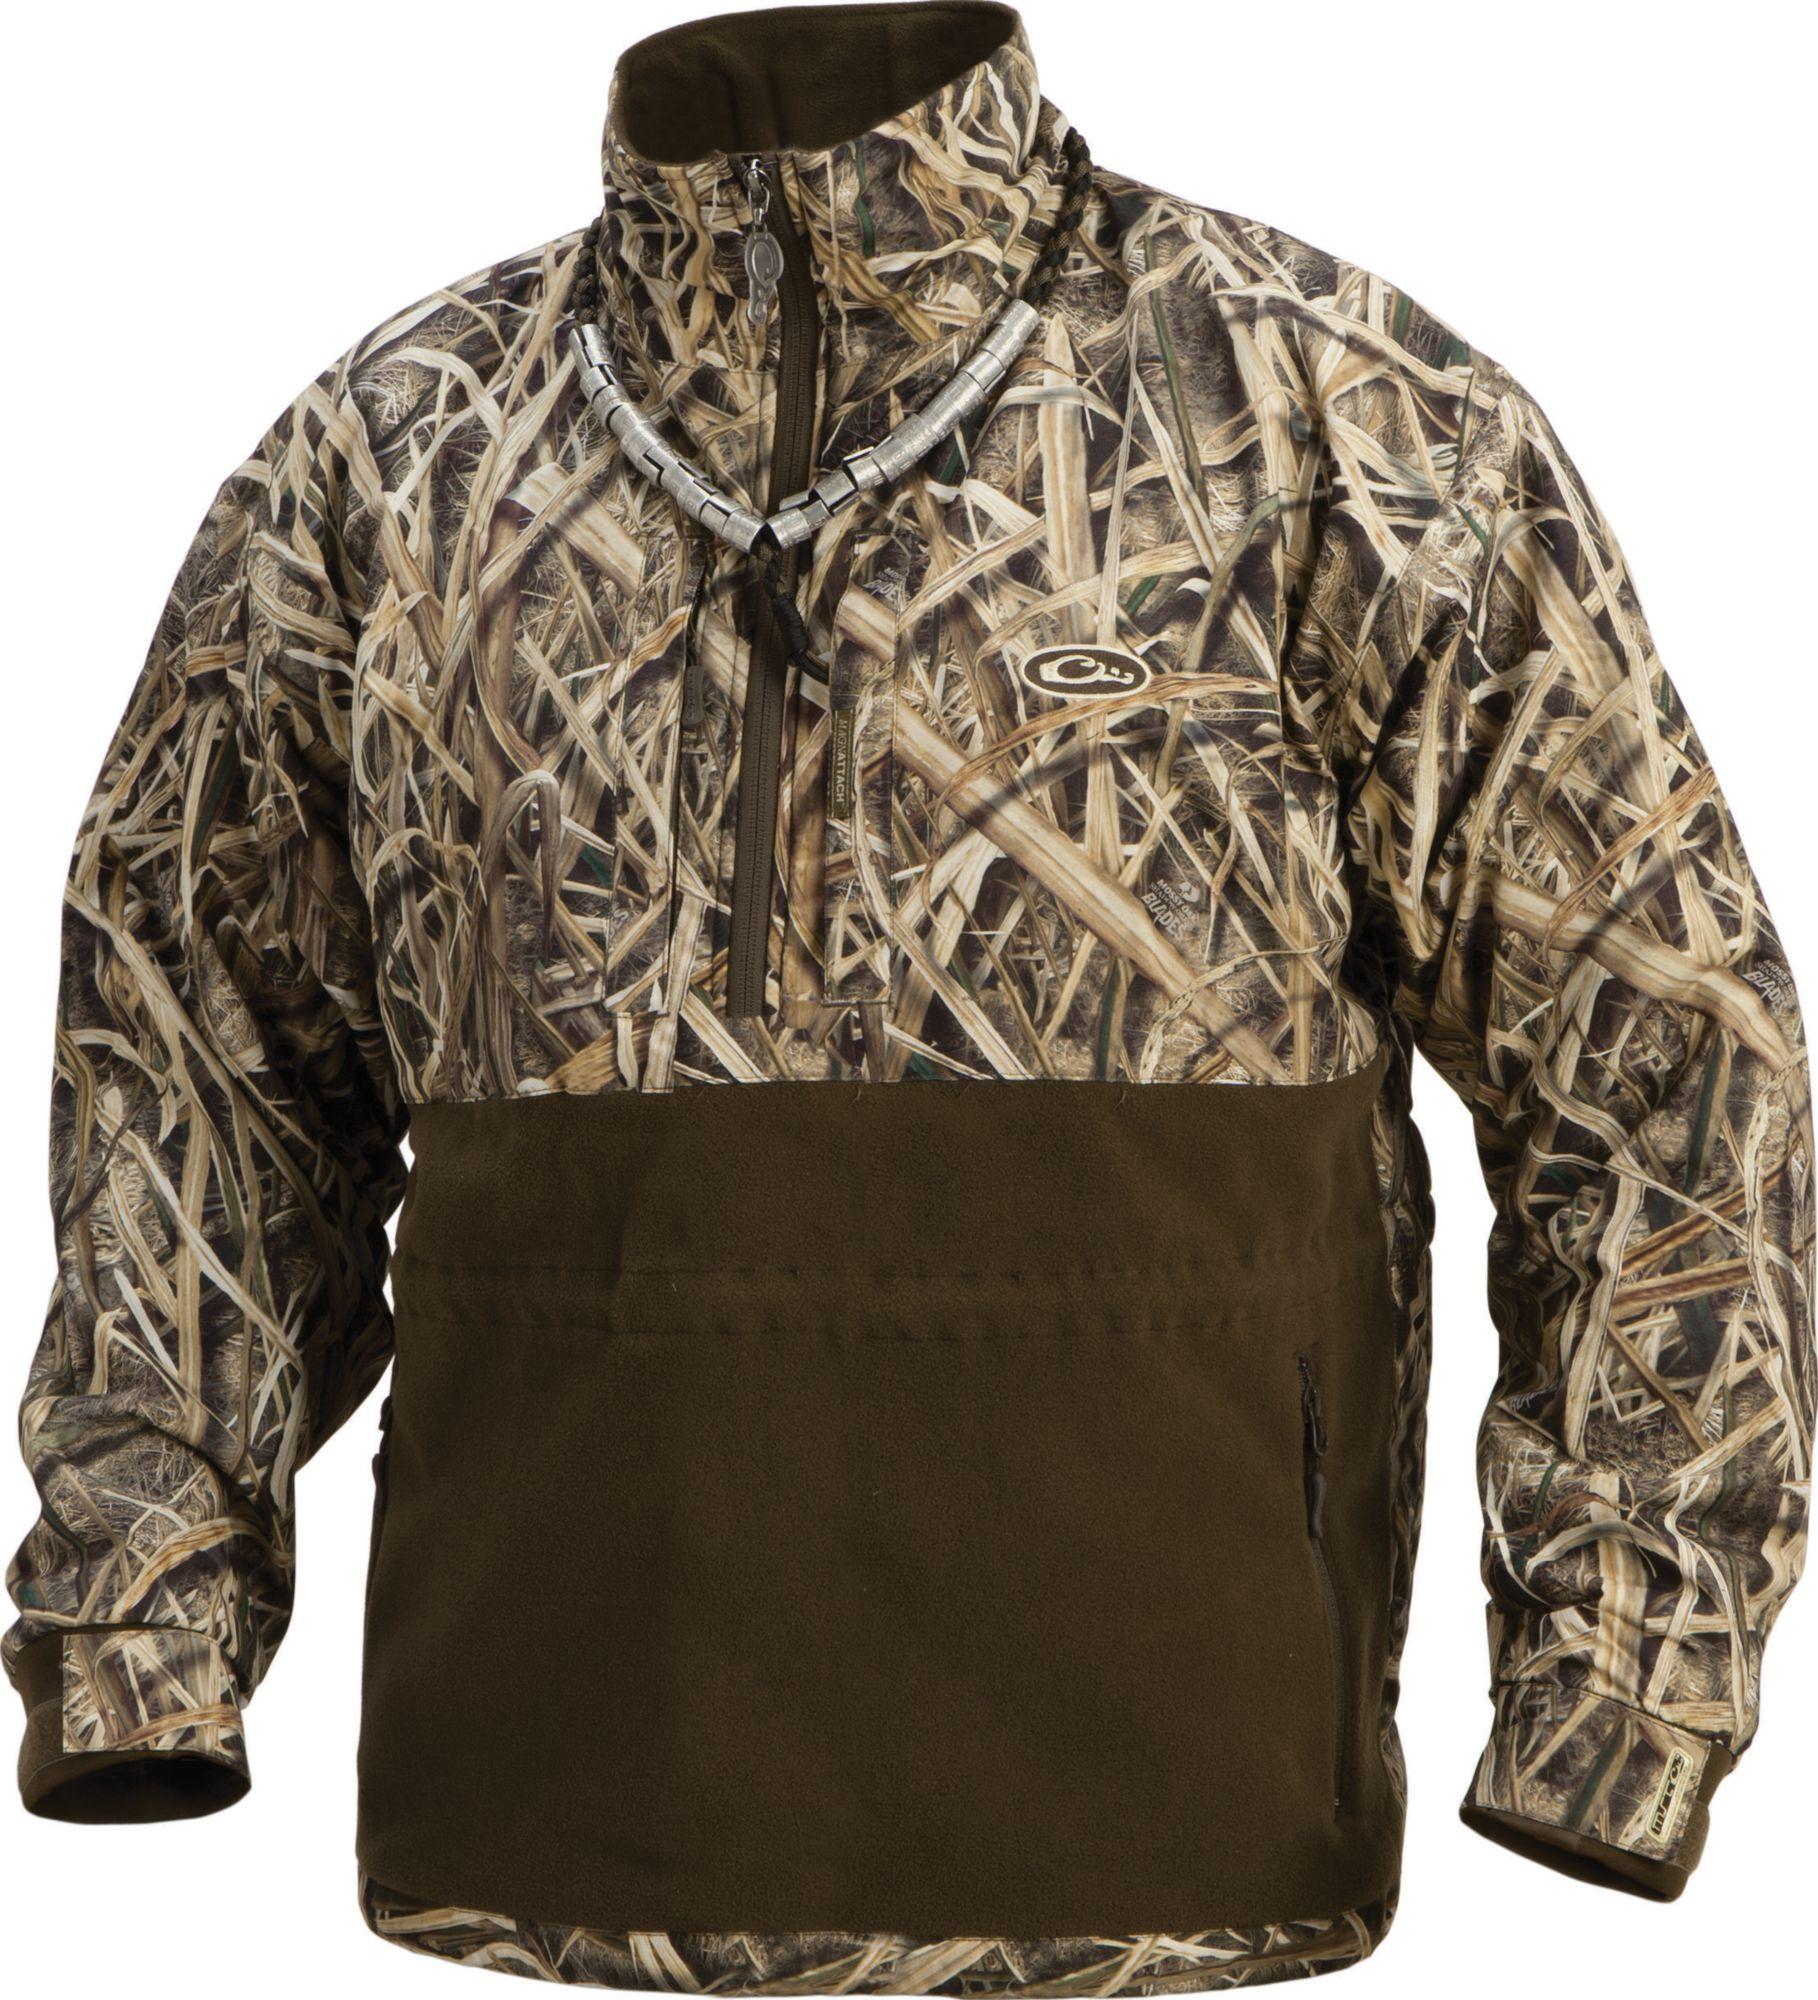 Drake Waterfowl Men's MST Eqwader Quarter Zip Jacket. 0:00. 0:00 / 0:00.  noImageFound ???